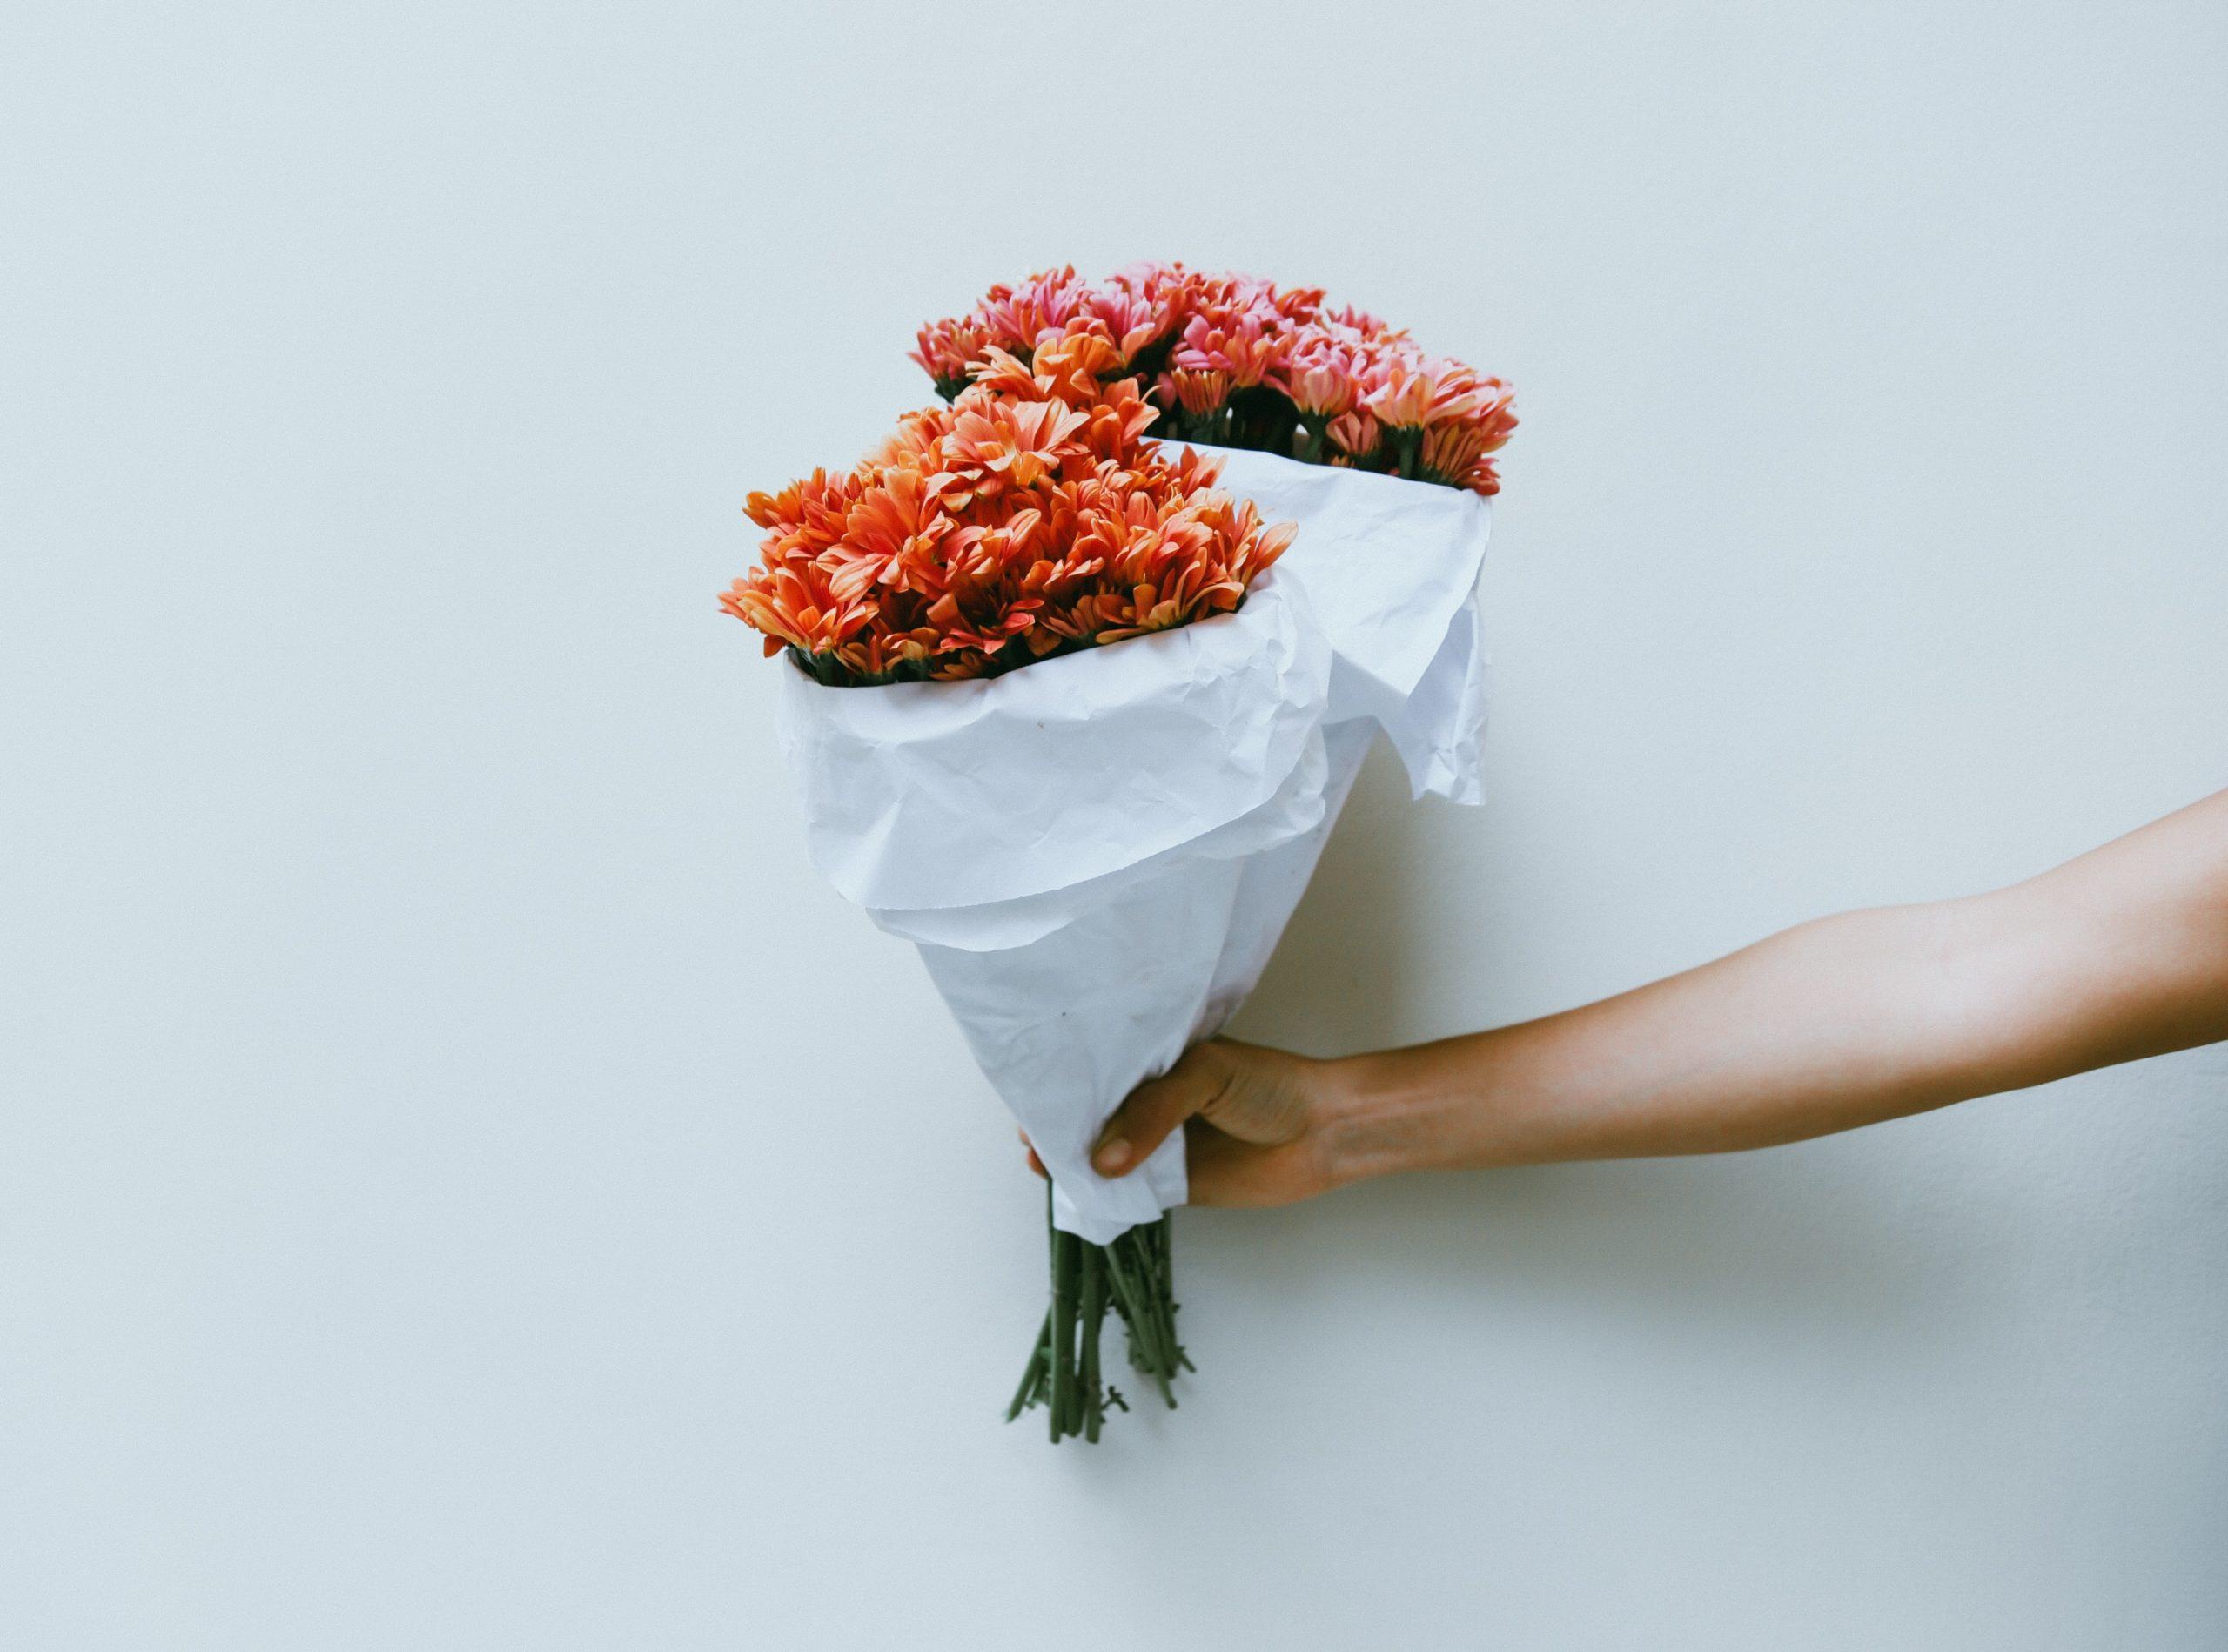 10 Best Flower Delivery Websites for a Valentine's Day Surprise